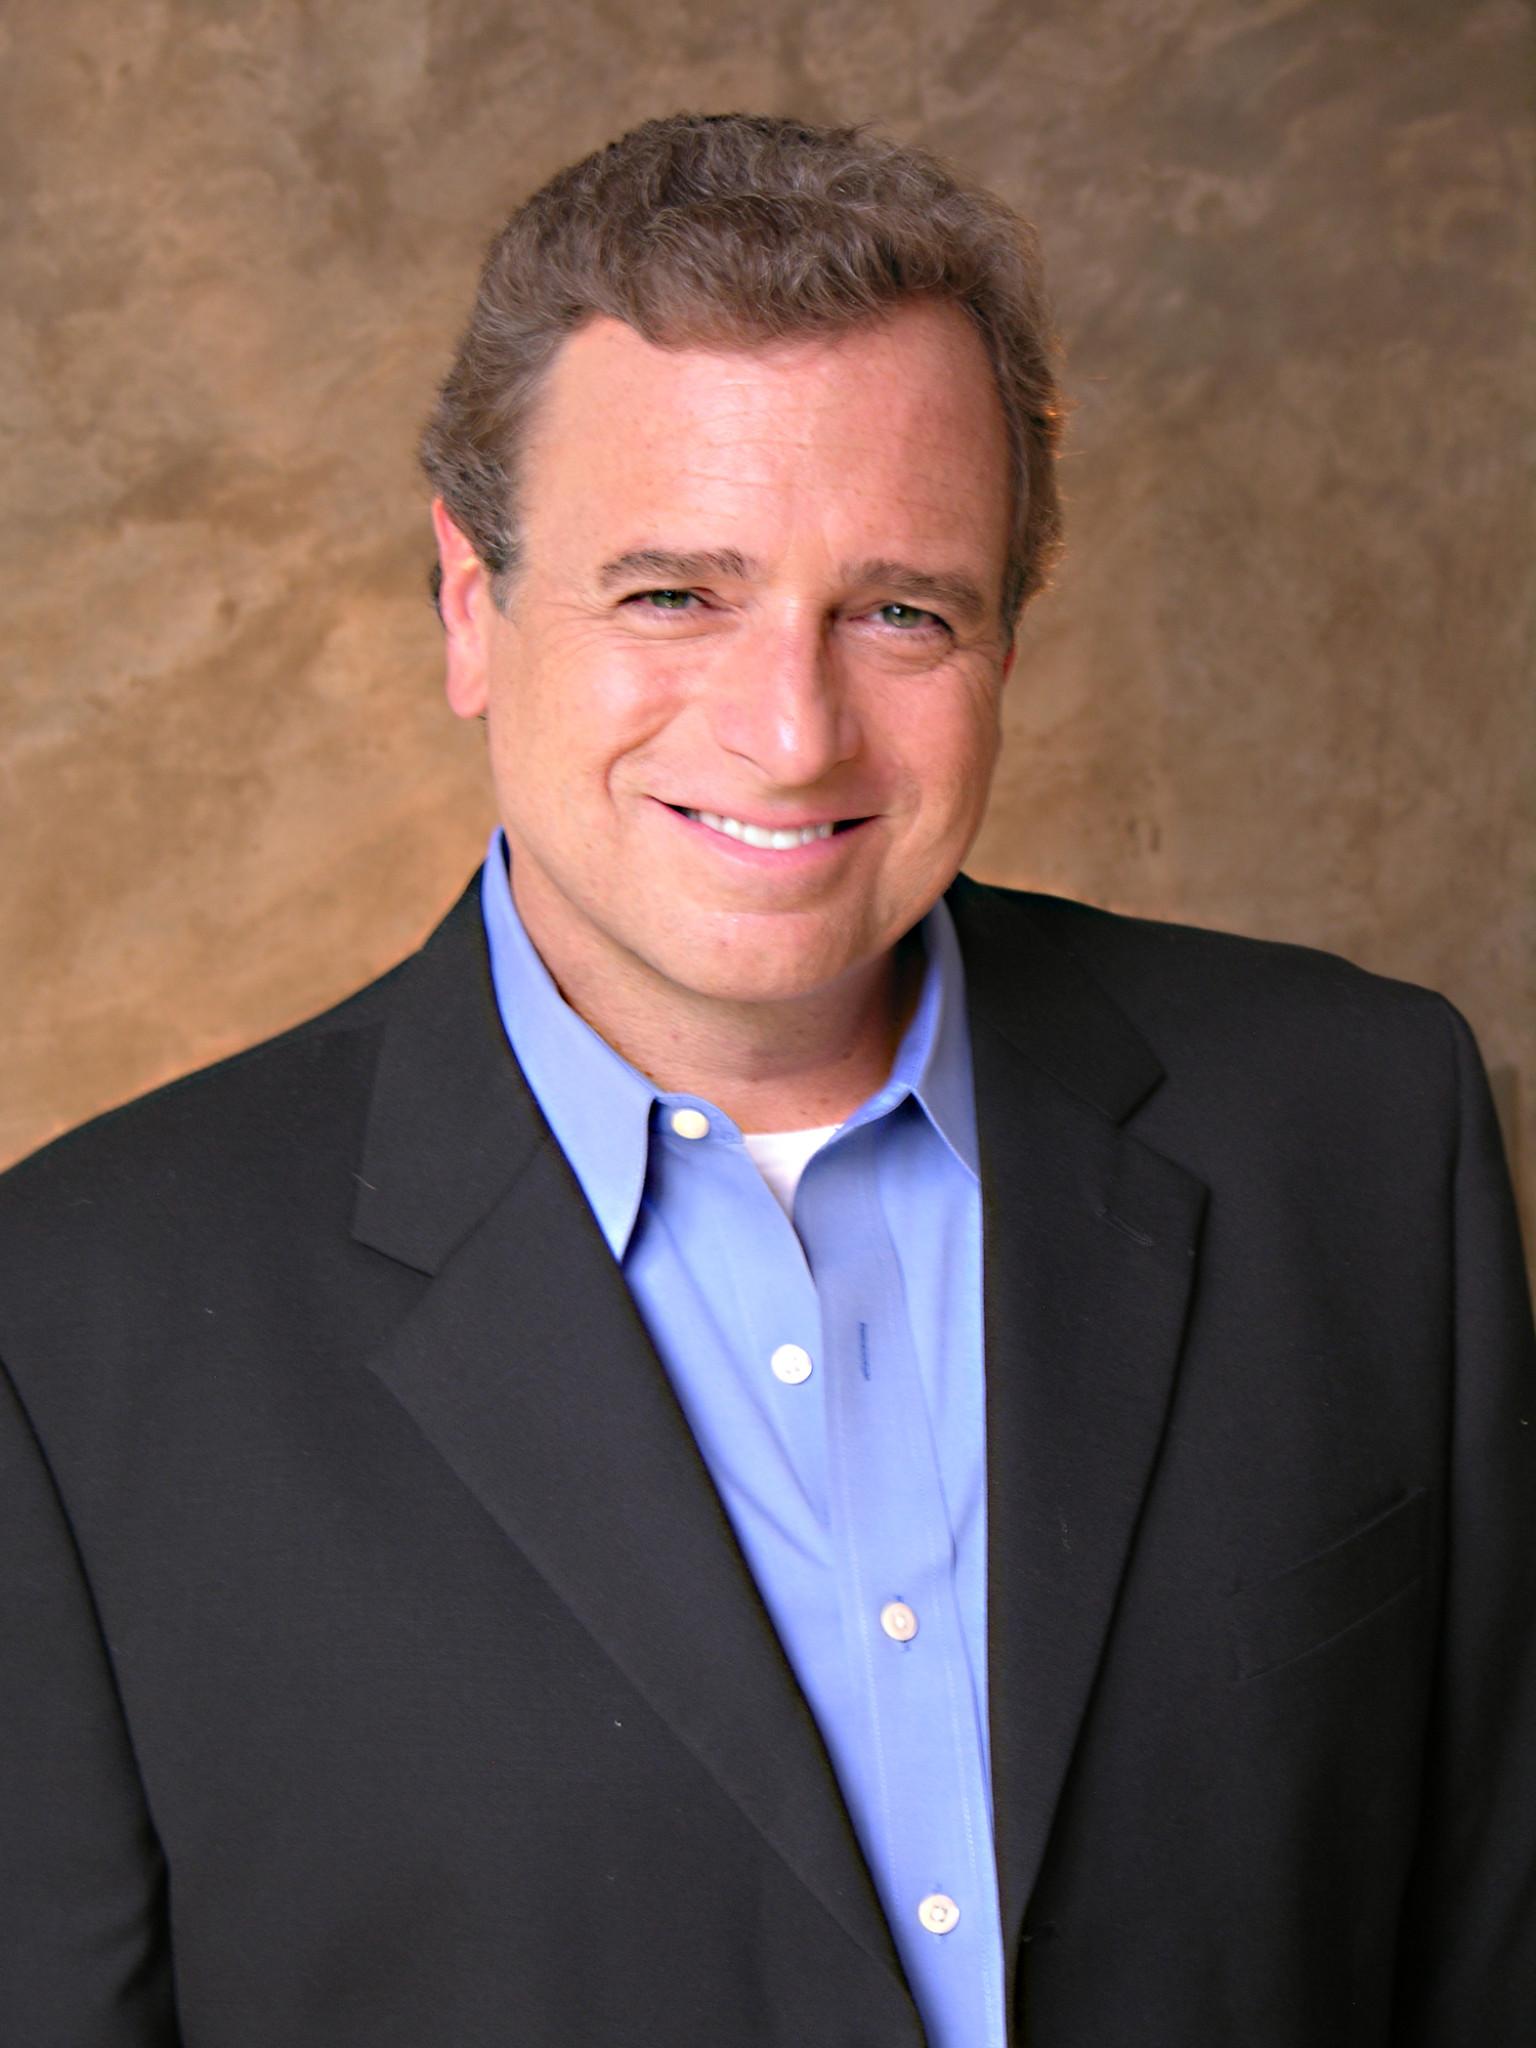 Honda Mobile Al >> John Seigenthaler, Former NBC News Host, Joining Al ...